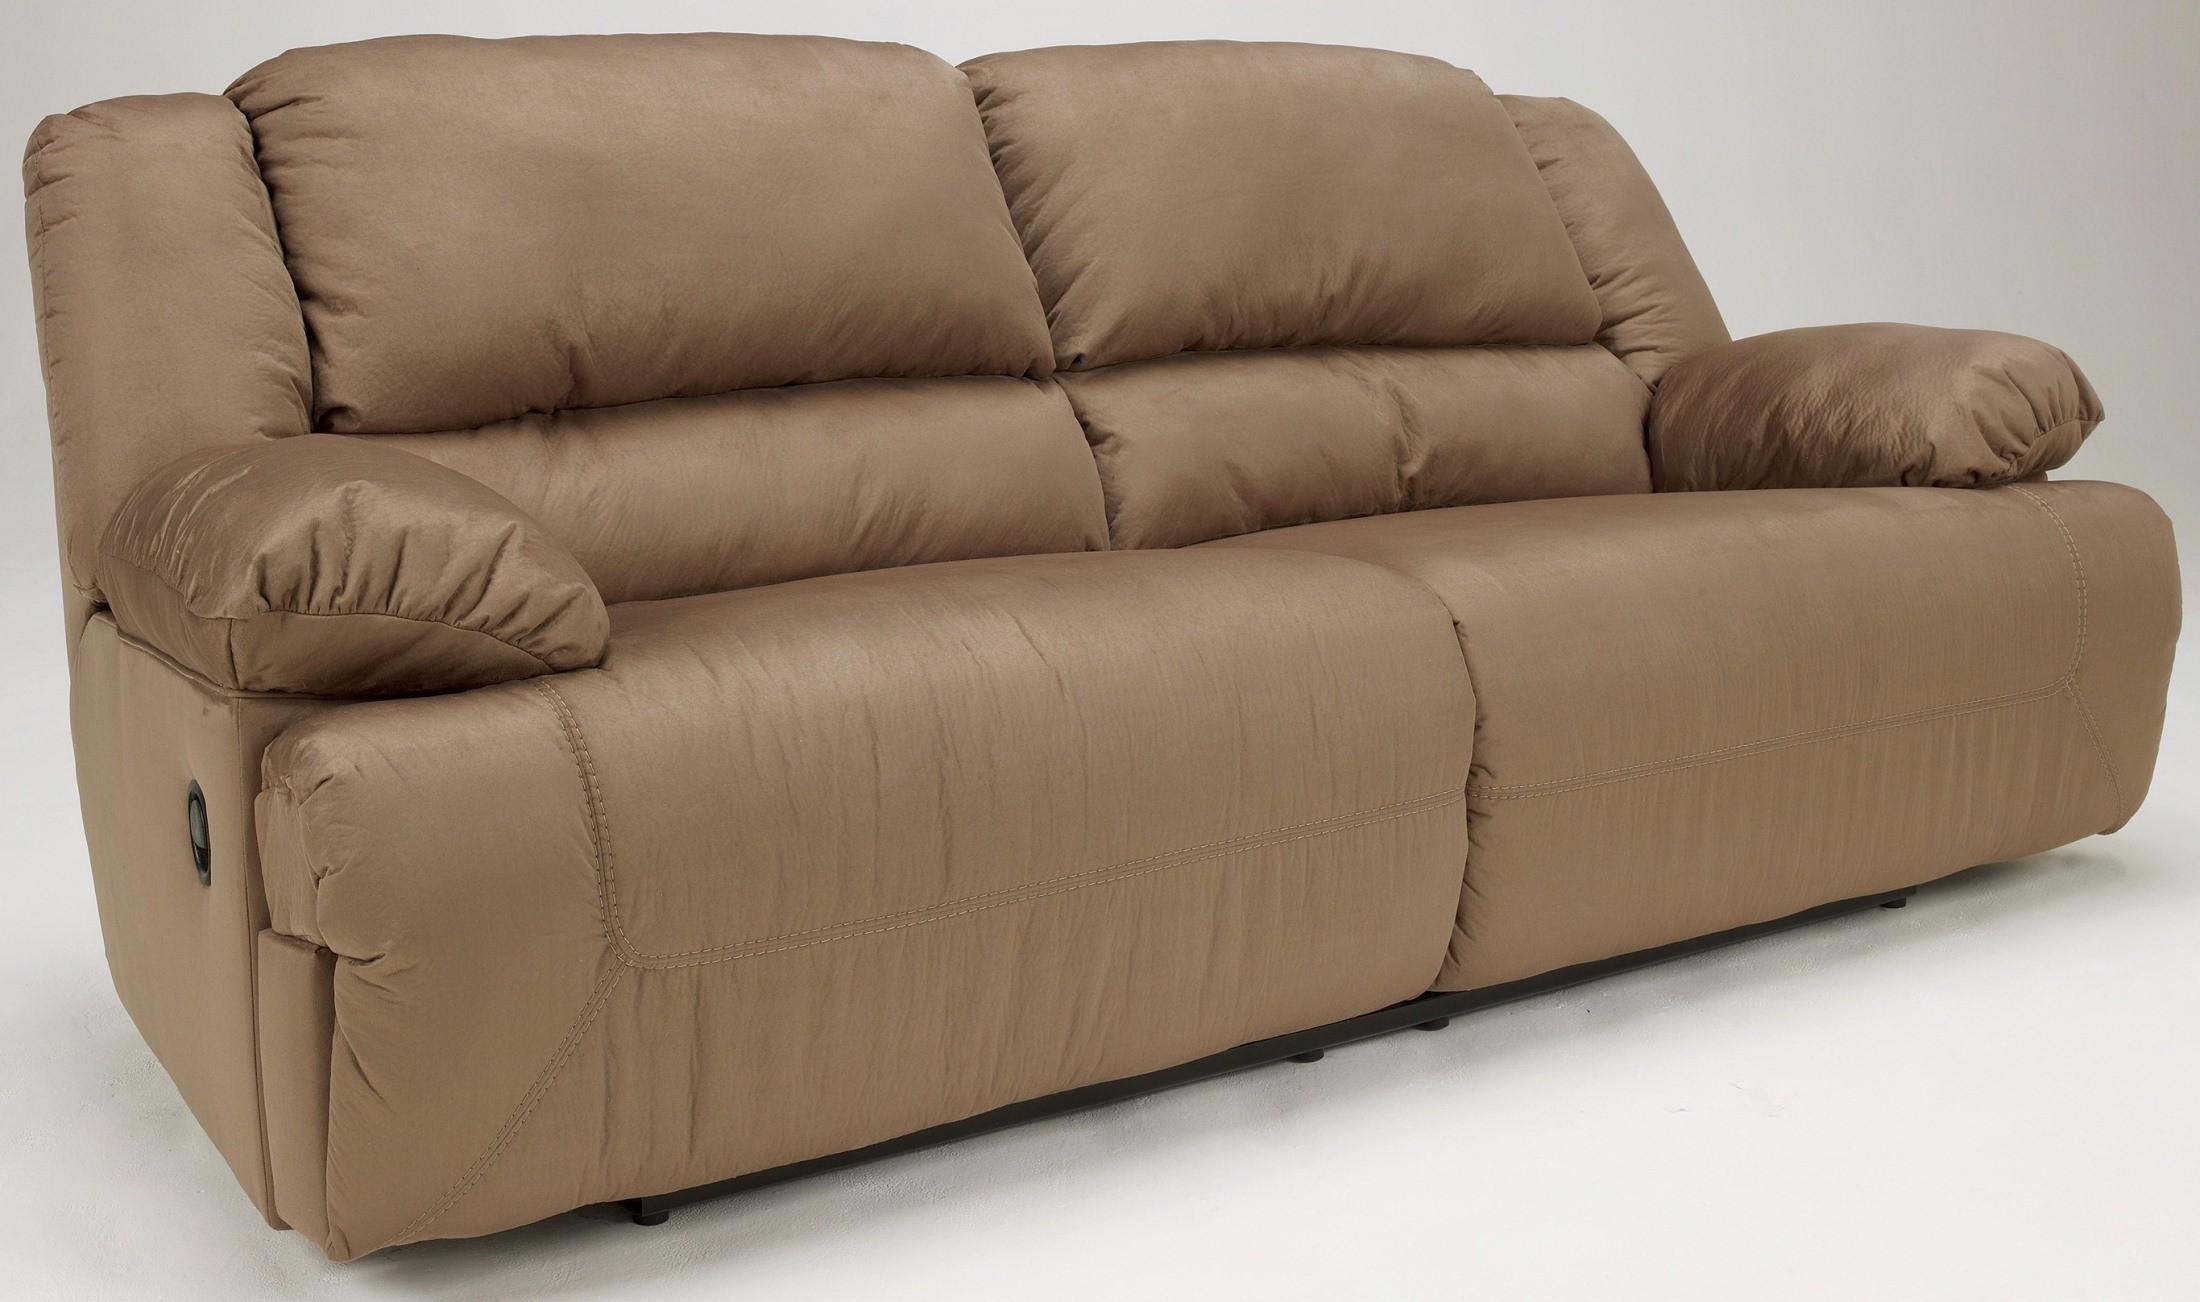 Hogan Mocha 2 Seat Reclining Sofa from Ashley (5780281) Coleman Furniture